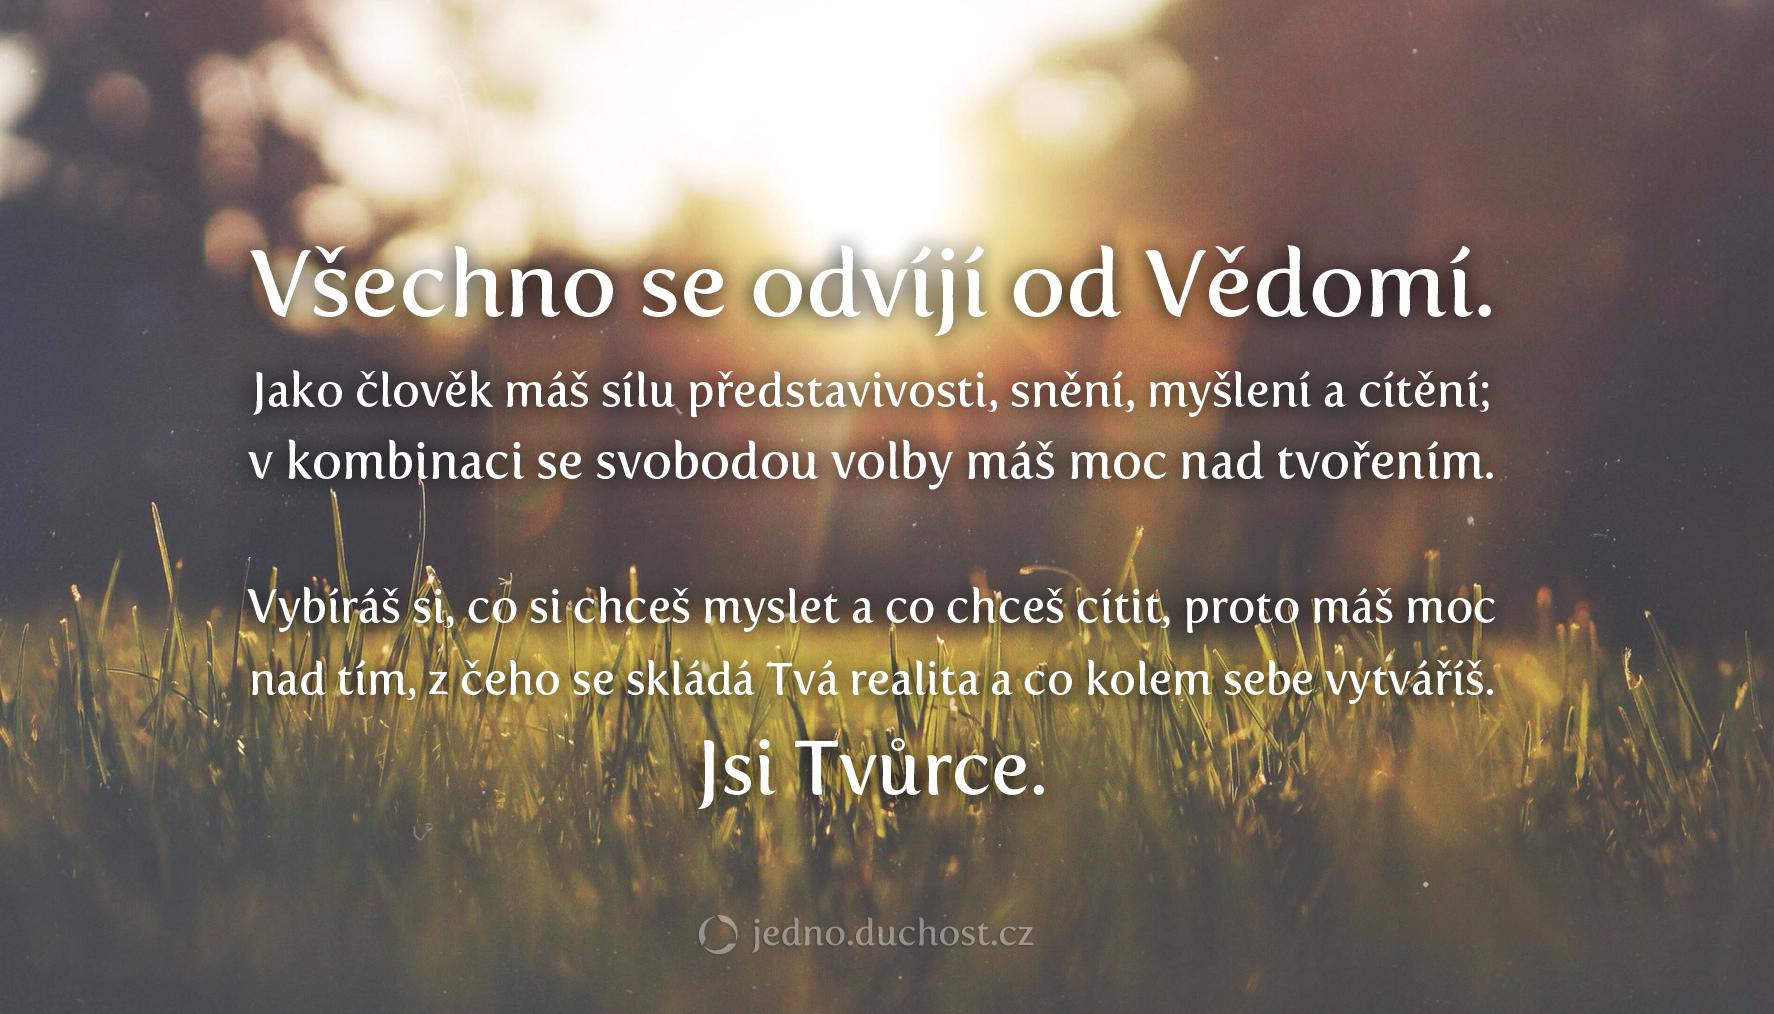 vse-se-odviji-od-vedomi-jsi-tvurce-jedno.duchost.cz